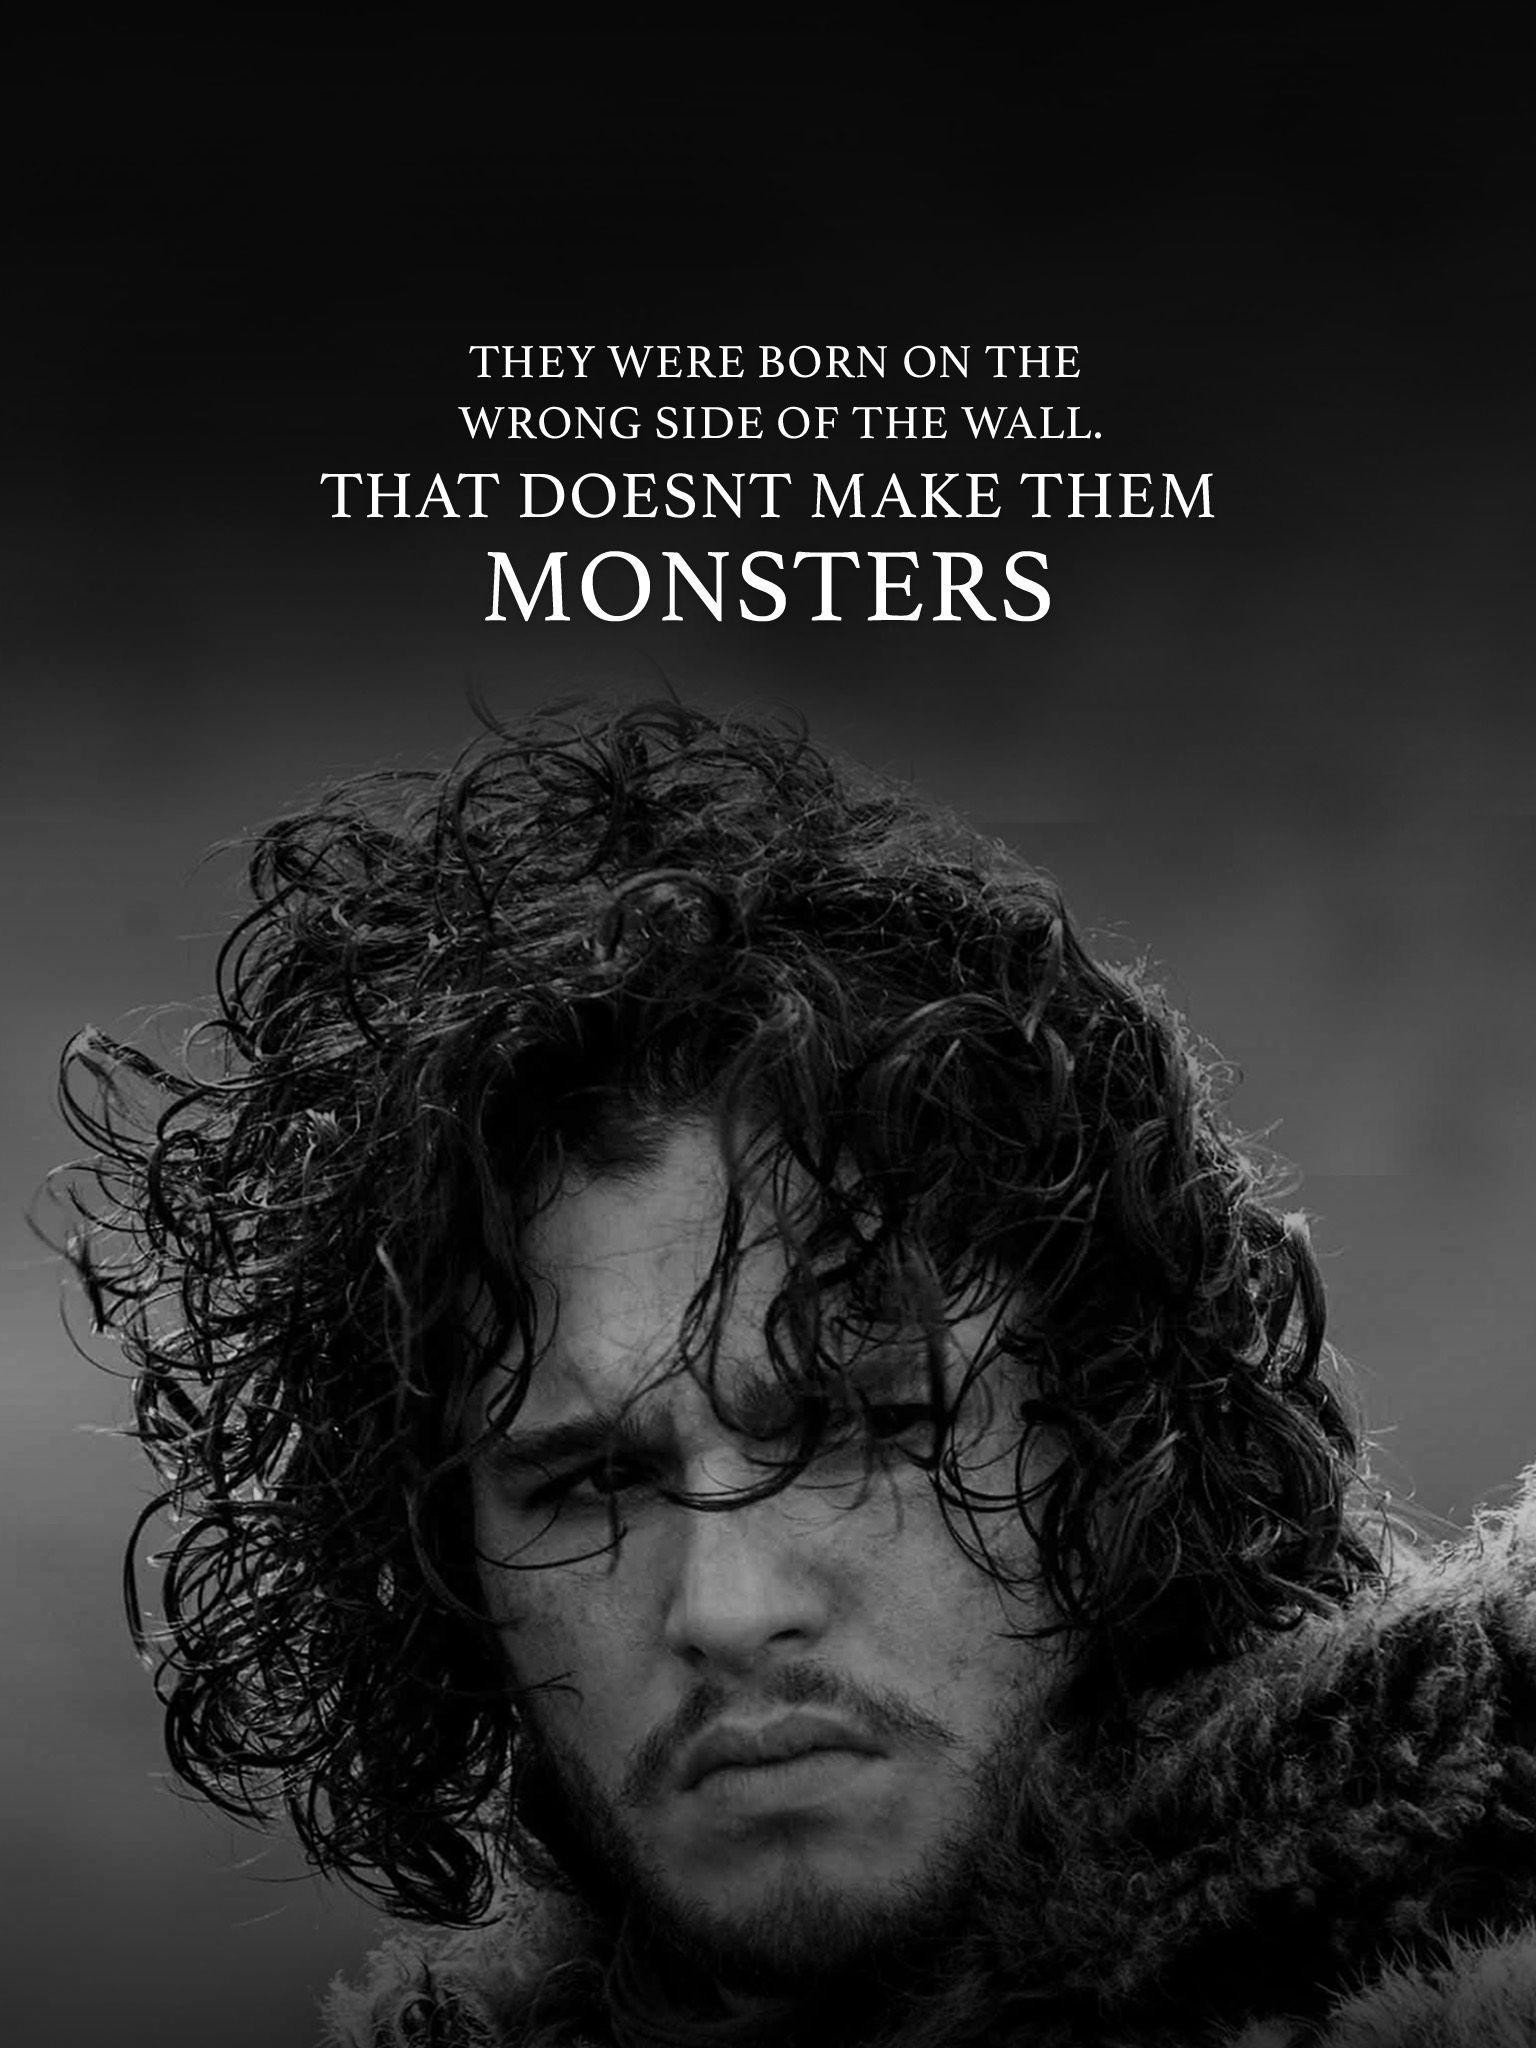 Jon Snow Wallpaper 69 Immagini